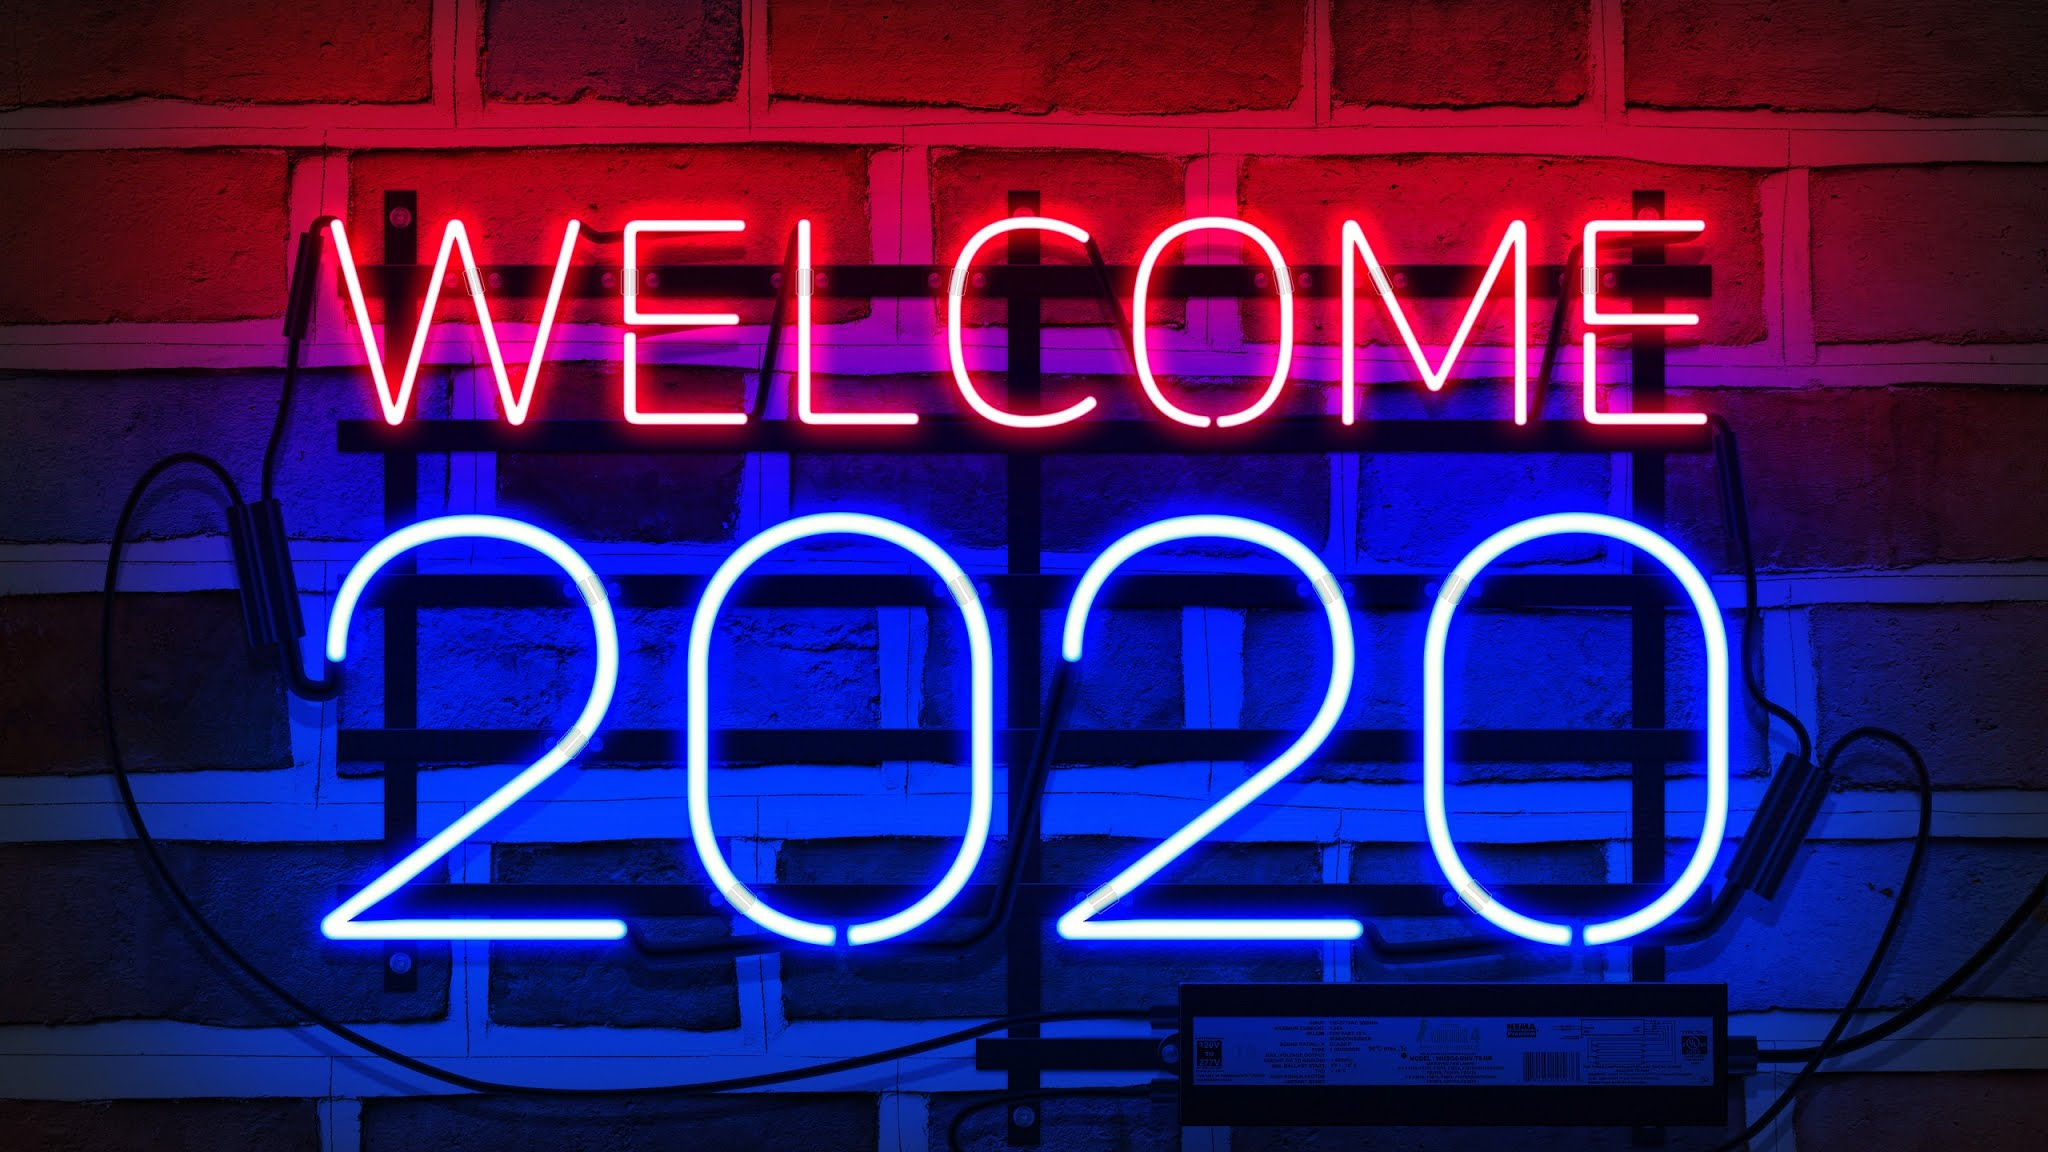 2020 New Year Wallpaper 2048x1152